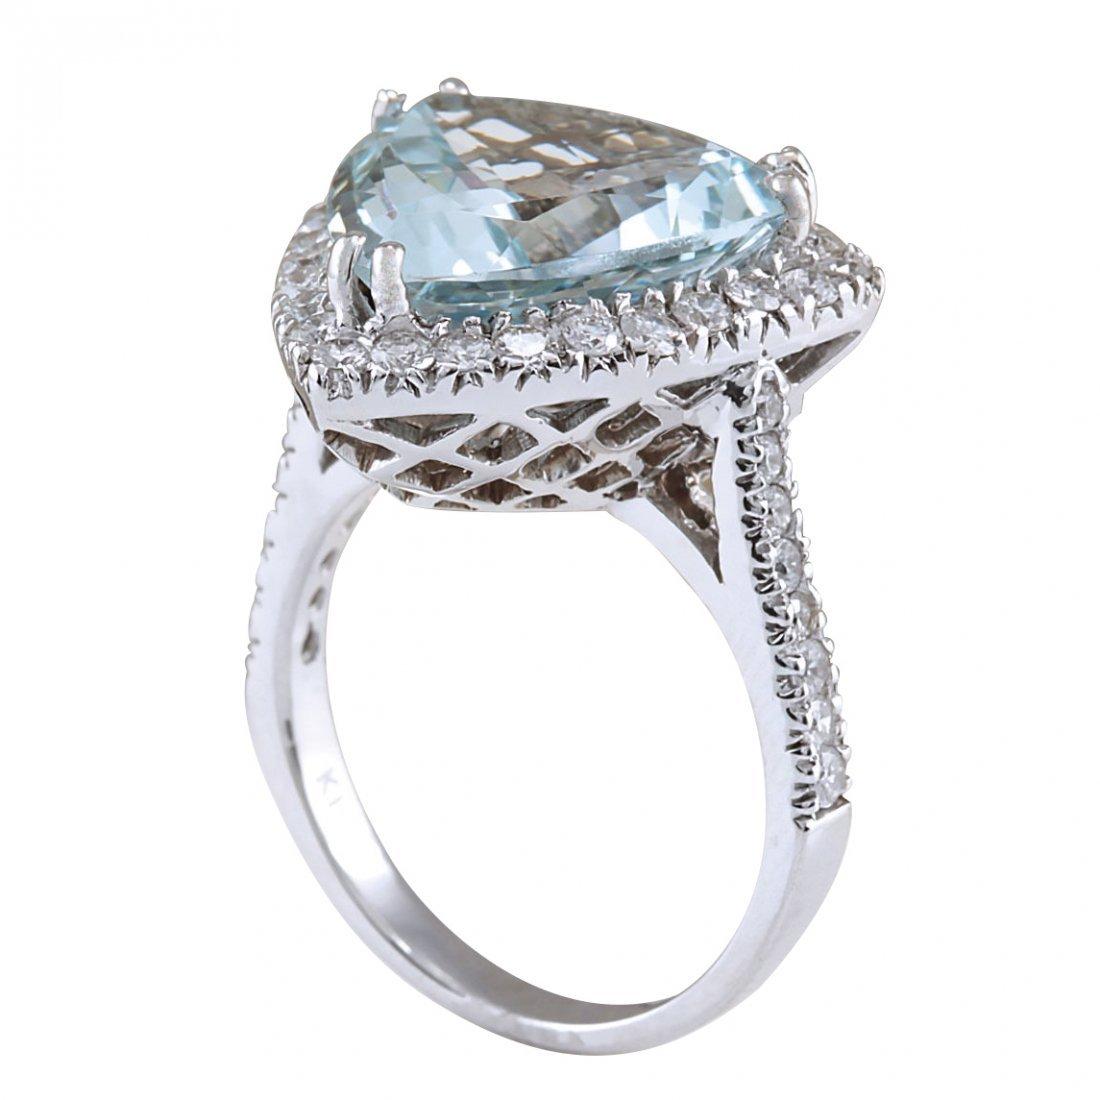 8.96CTW Natural Aquamarine And Diamond Ring In 14K - 3